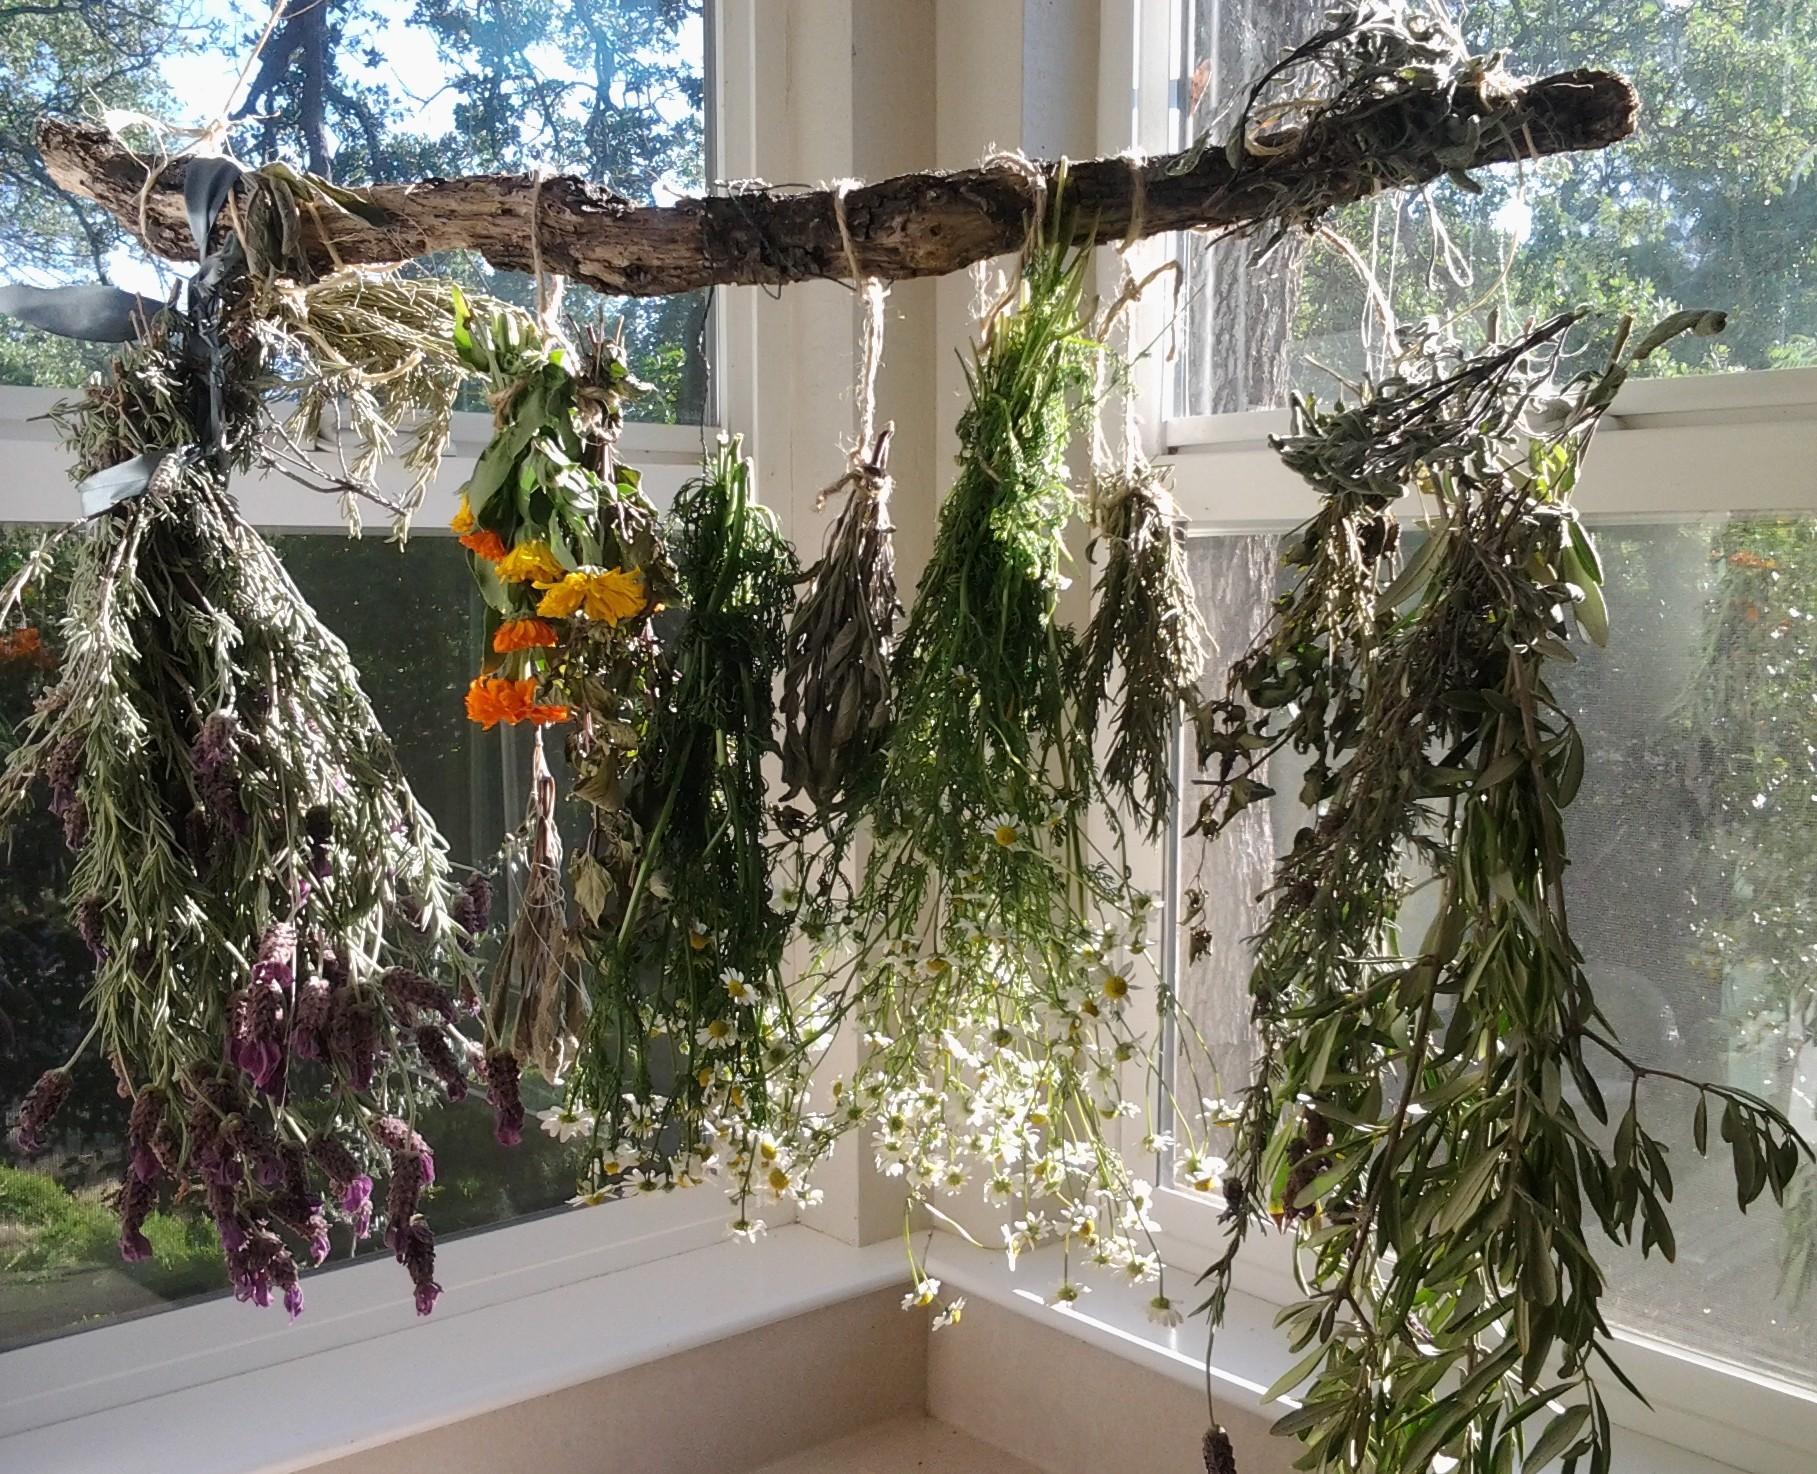 lavender,rosemary,calendula,rosemary,mint & chamomile drying